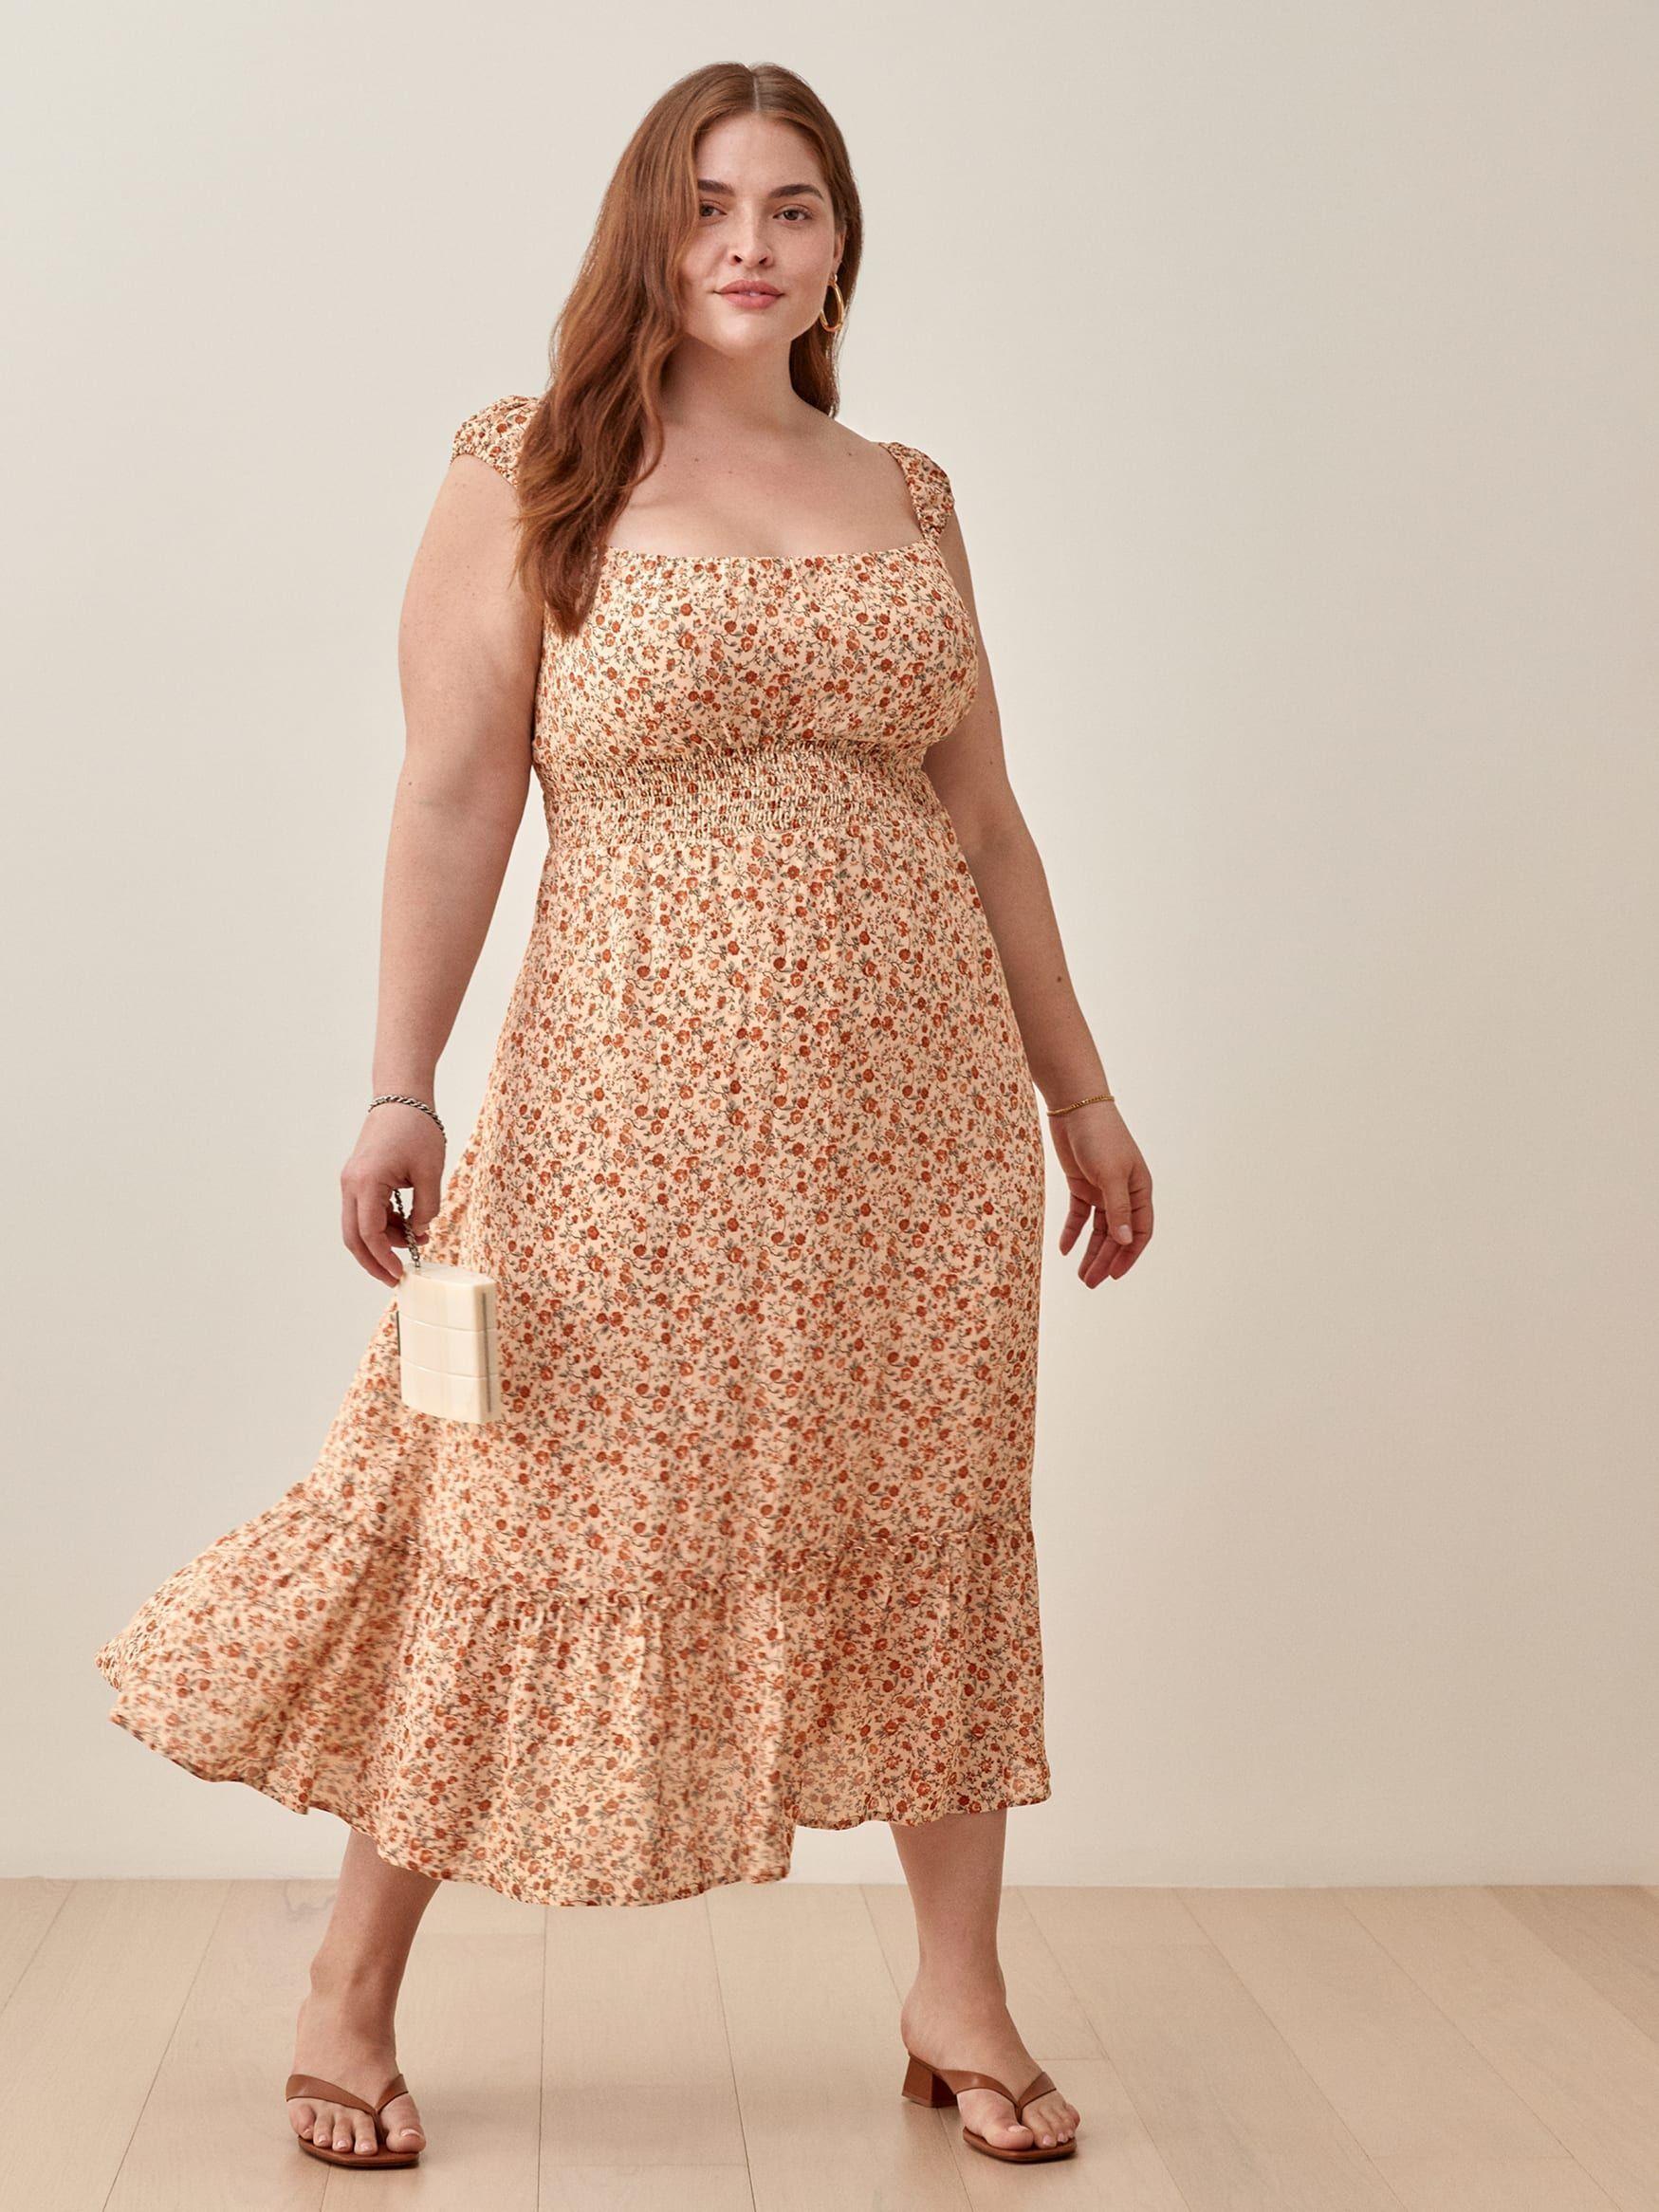 Plus Size Sundresses for Weddings